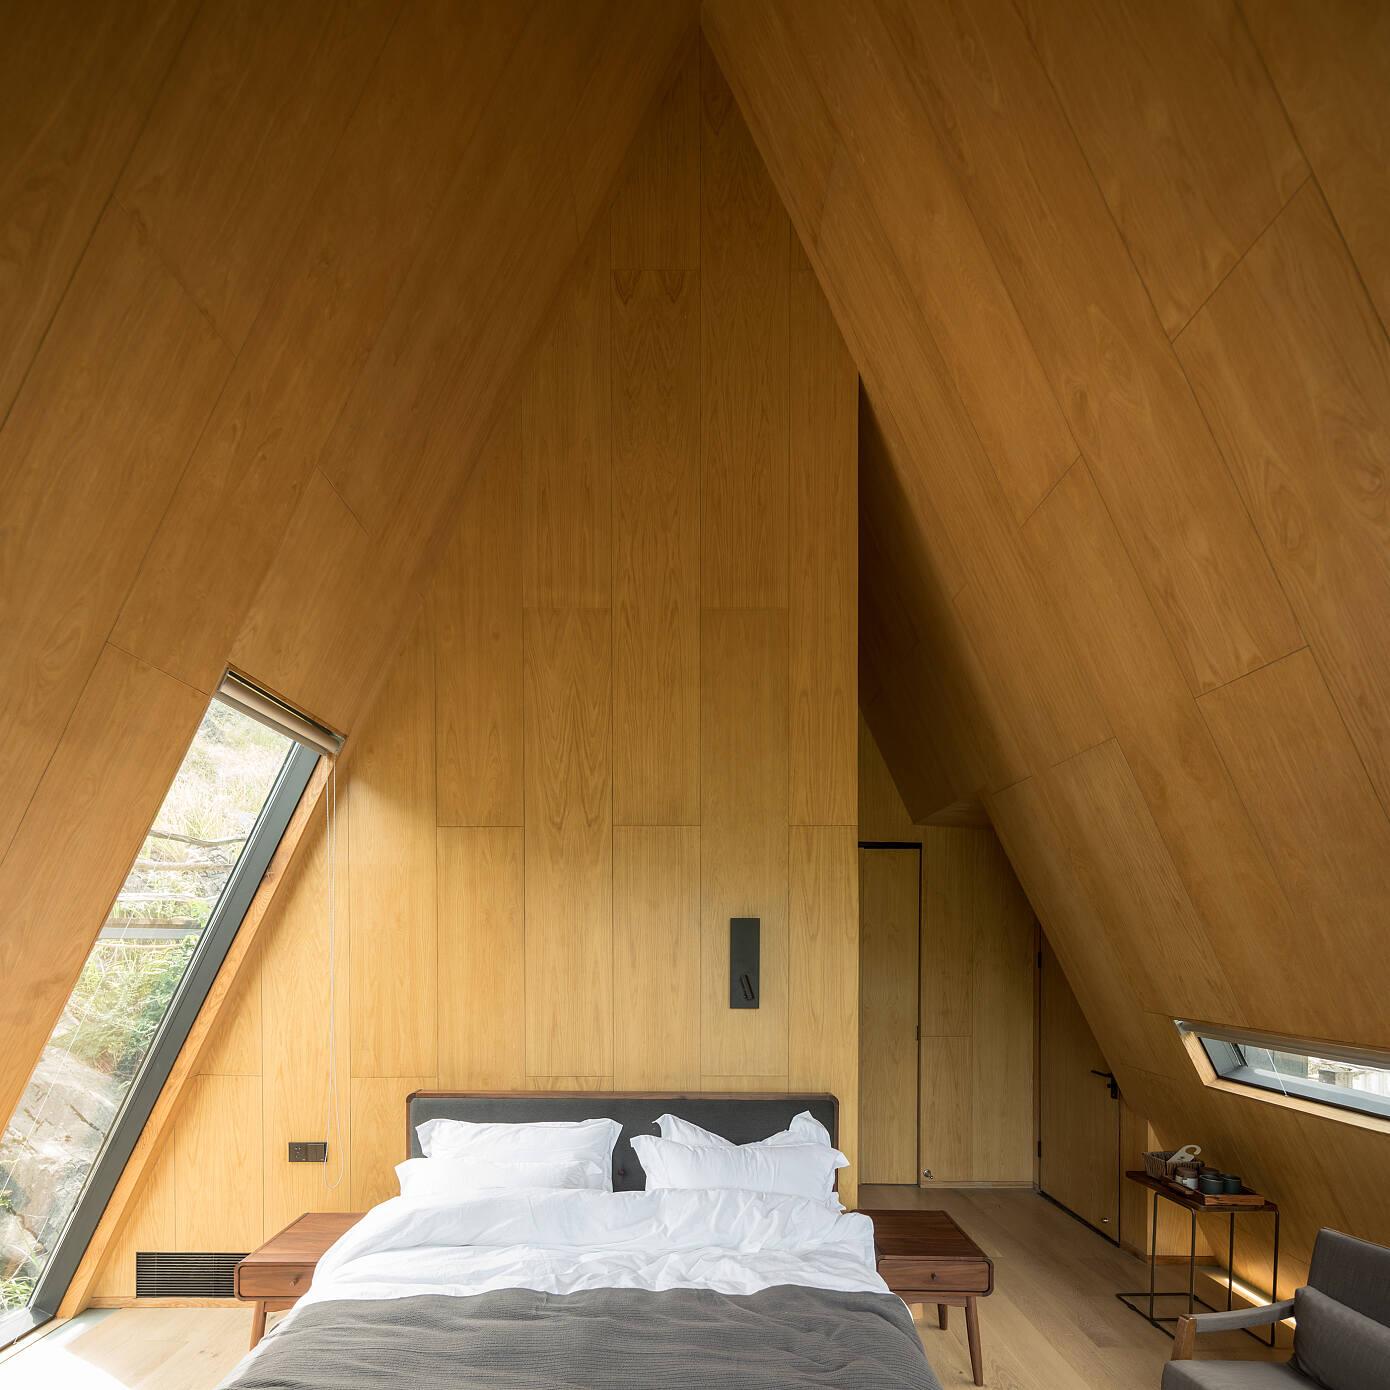 Woodhouse Hotel by ZJJZ Atelier